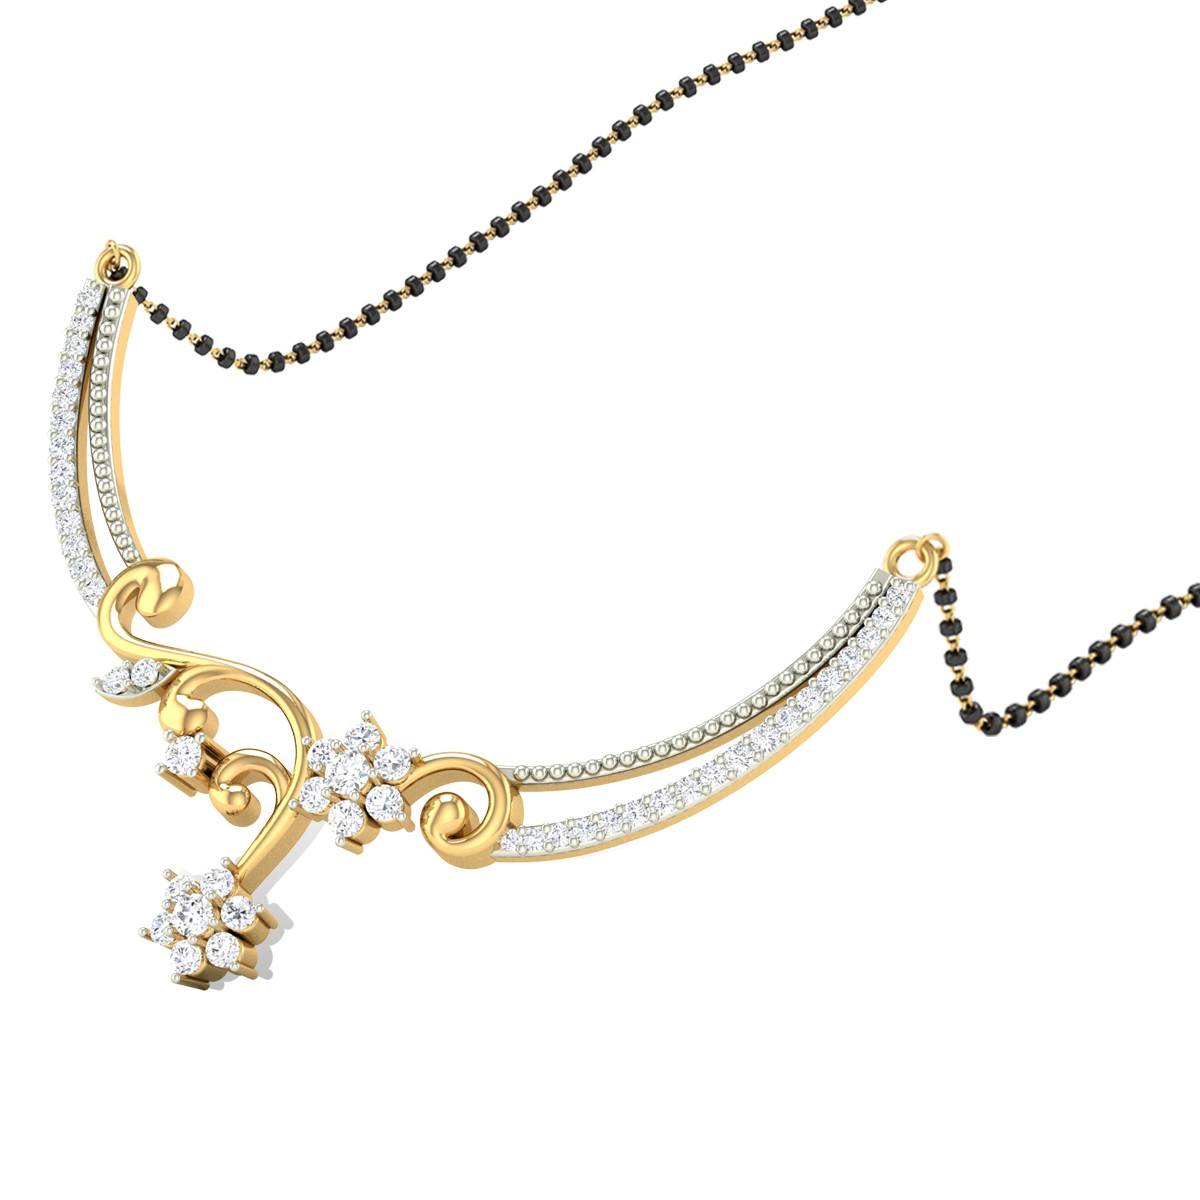 Charisma Floral Diamond Mangalsutra